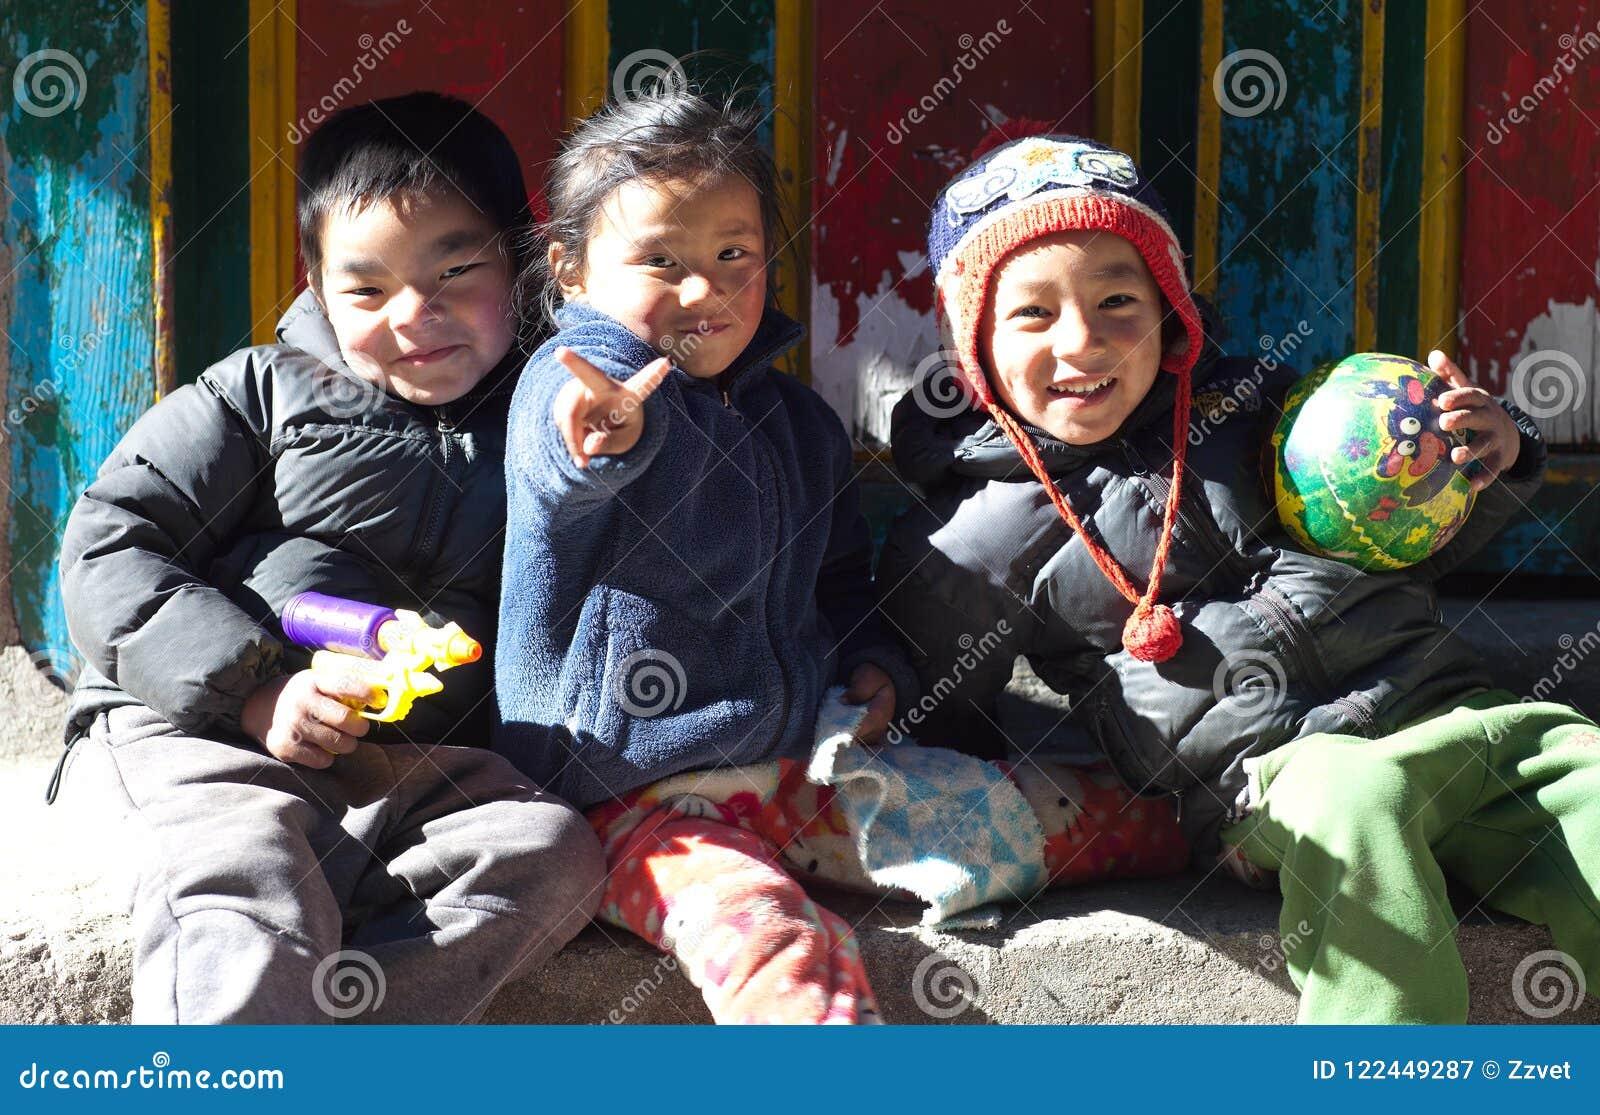 Nepalese Children From Namche Bazaar, Nepal Editorial Photography